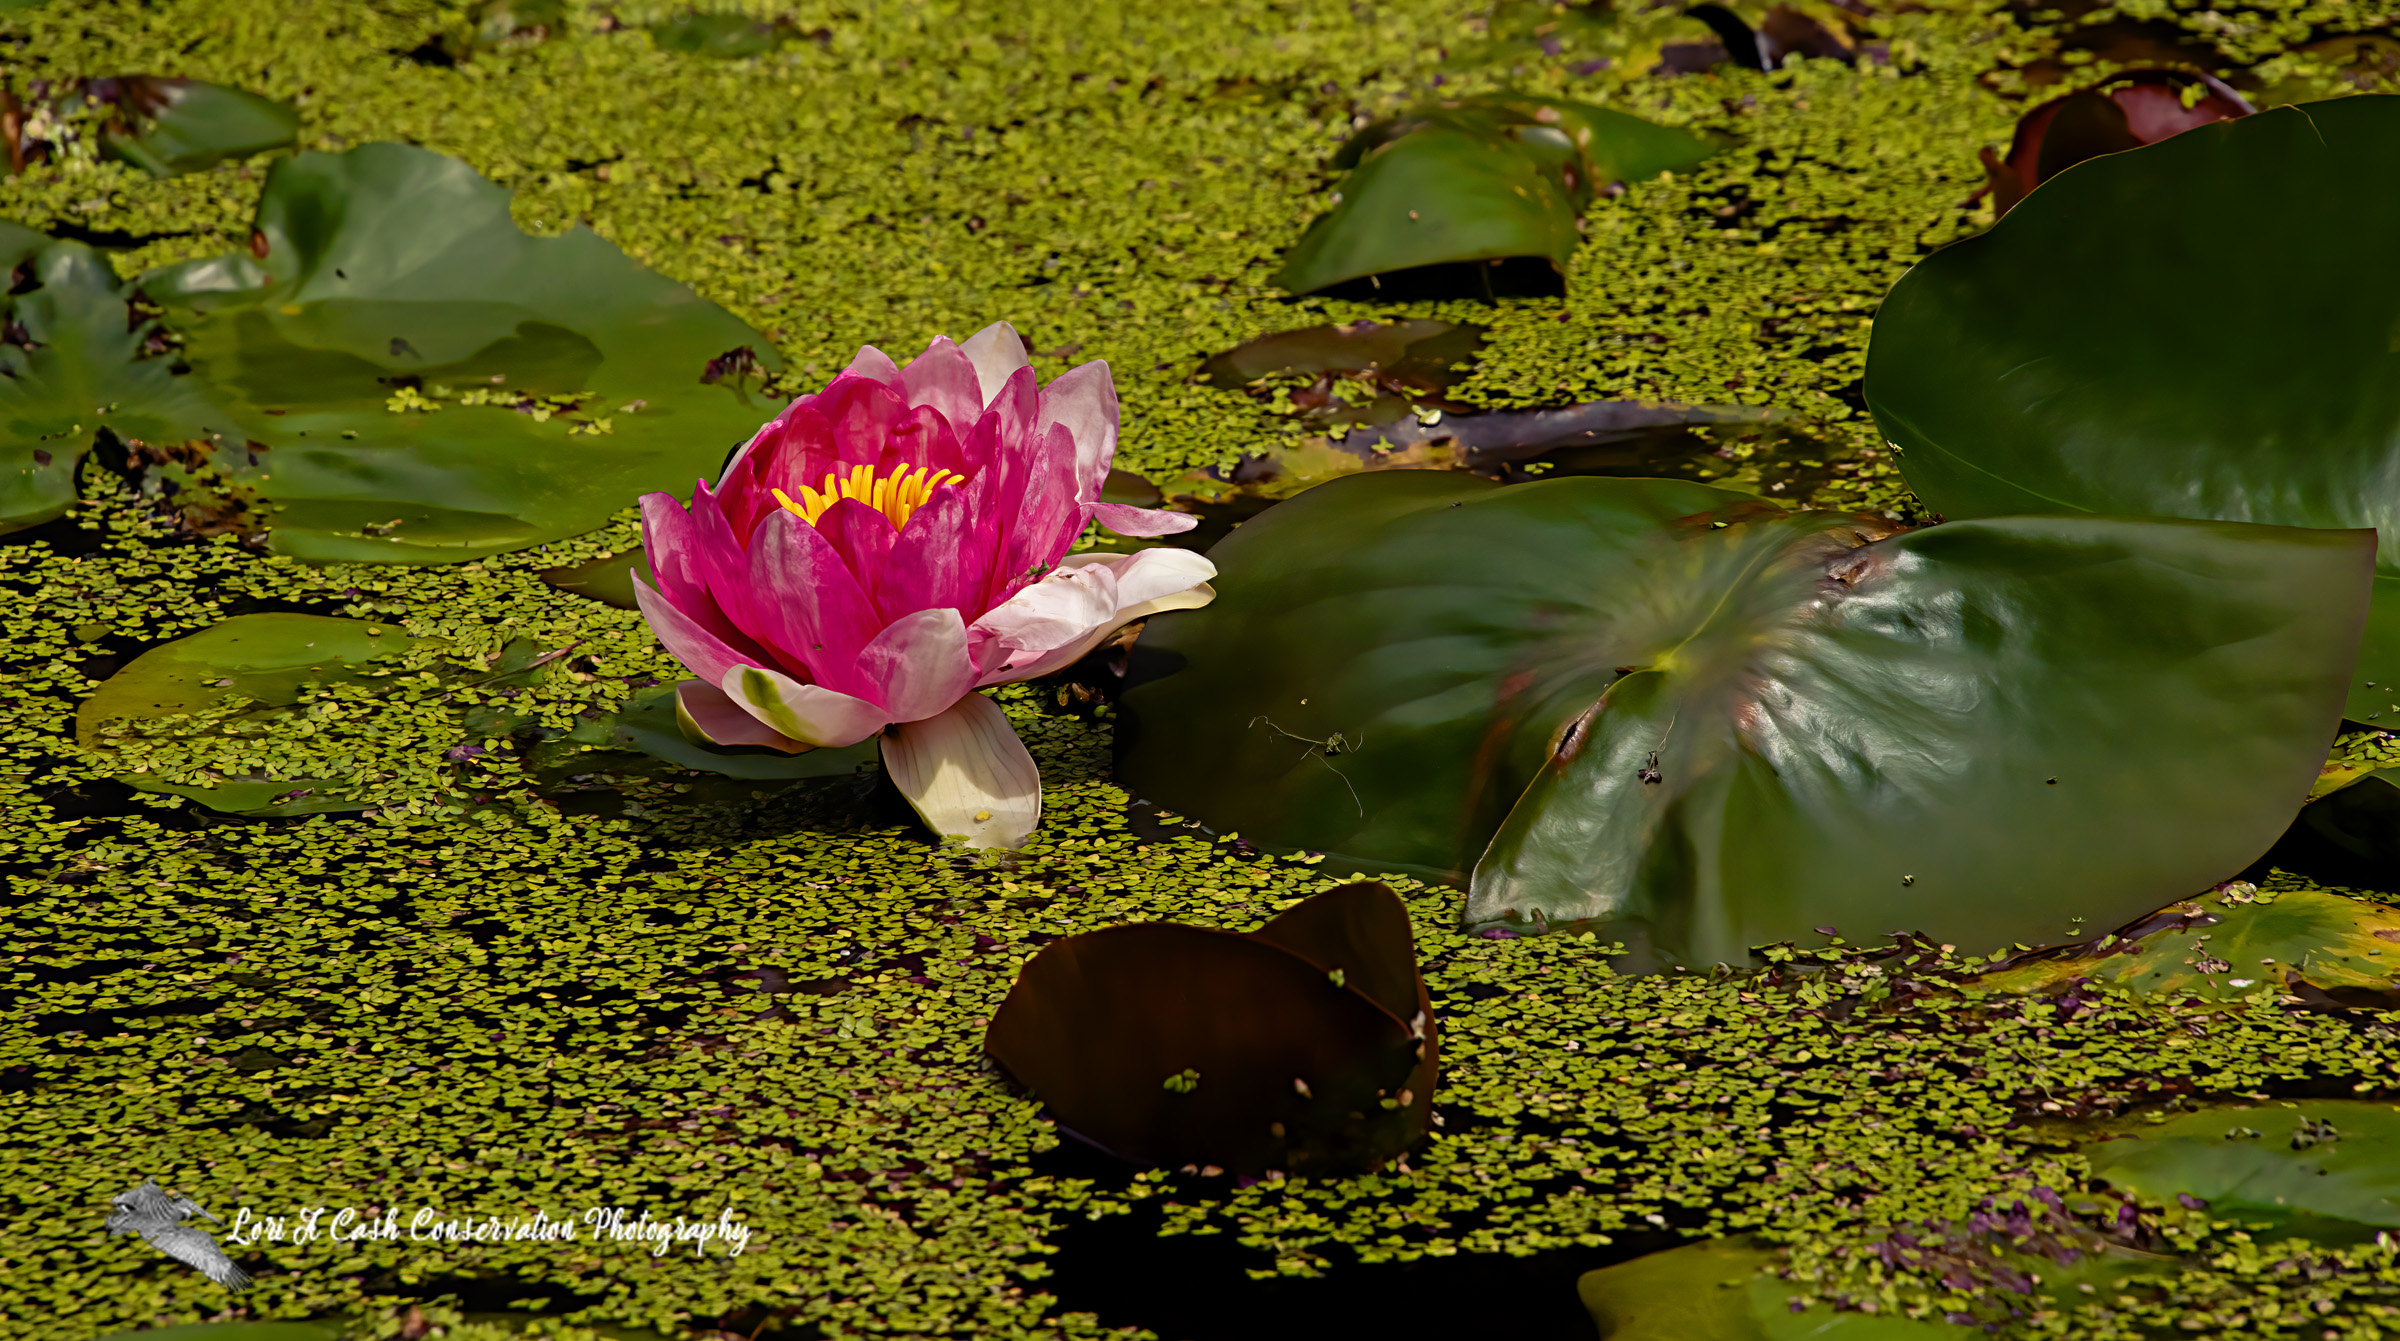 Single pink waterlily in bloom in a waterlily garden at the Norfolk Botanical Garden in Norfolk, Virginia.